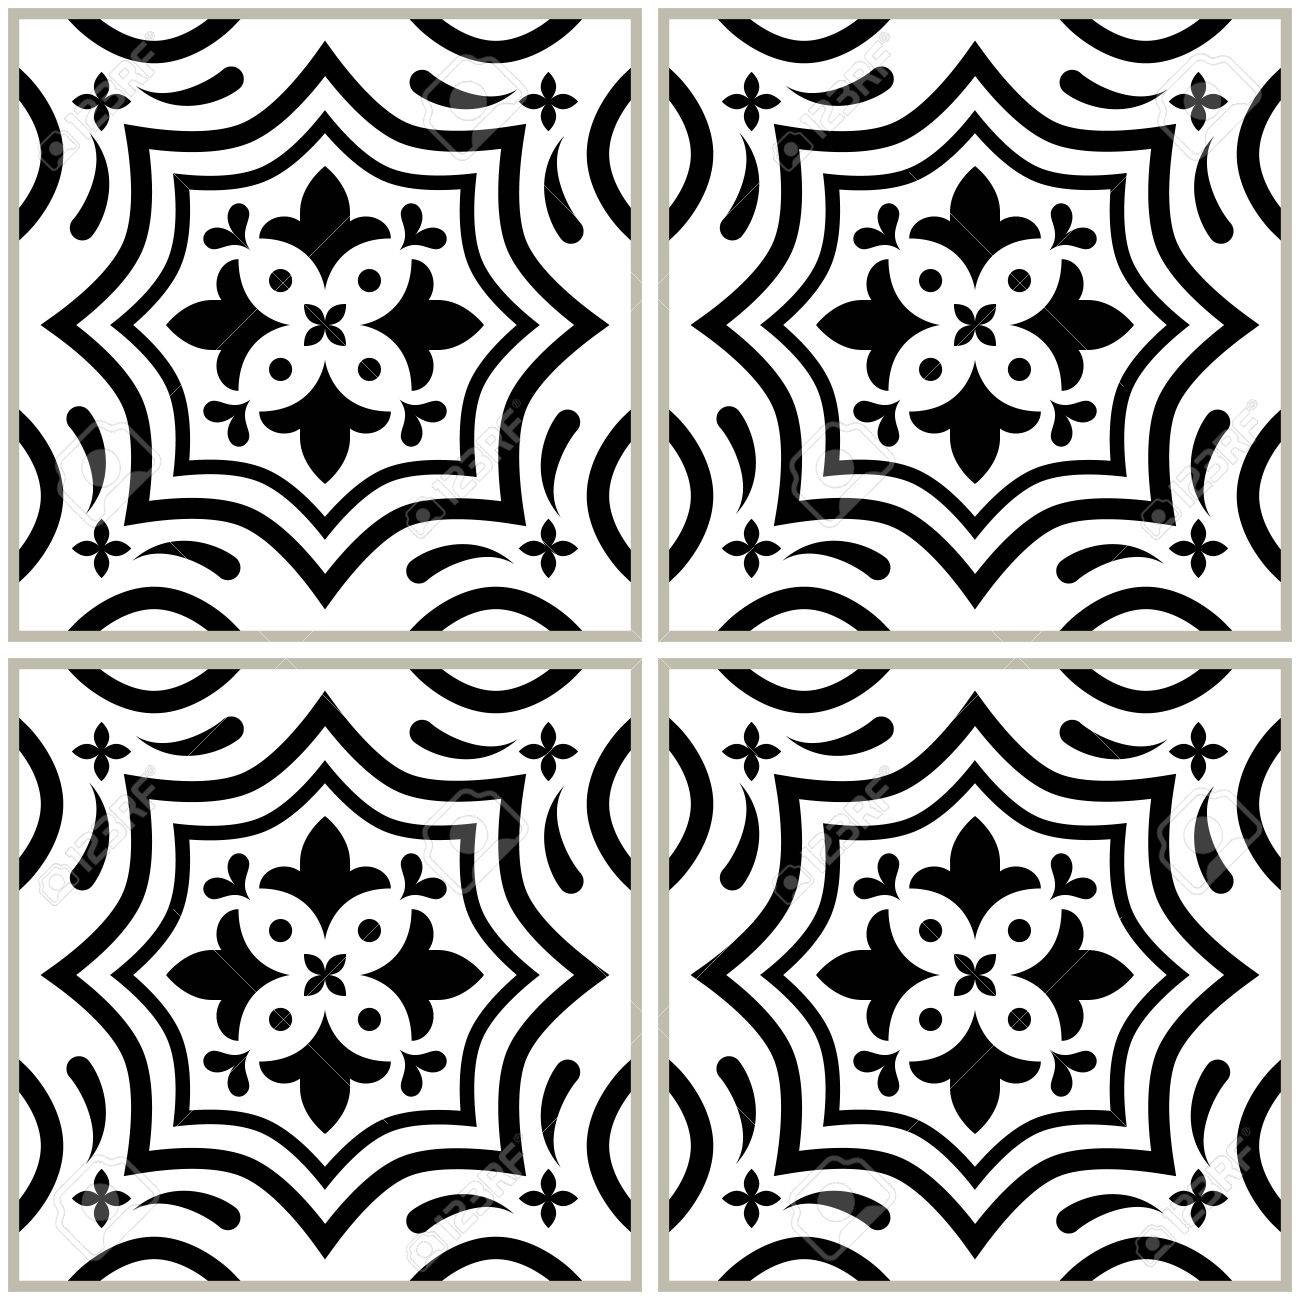 Zwart Wit Tegels.Portugees Tegels Patroon Azulejo Zwart Wit Ontwerp Naadloze